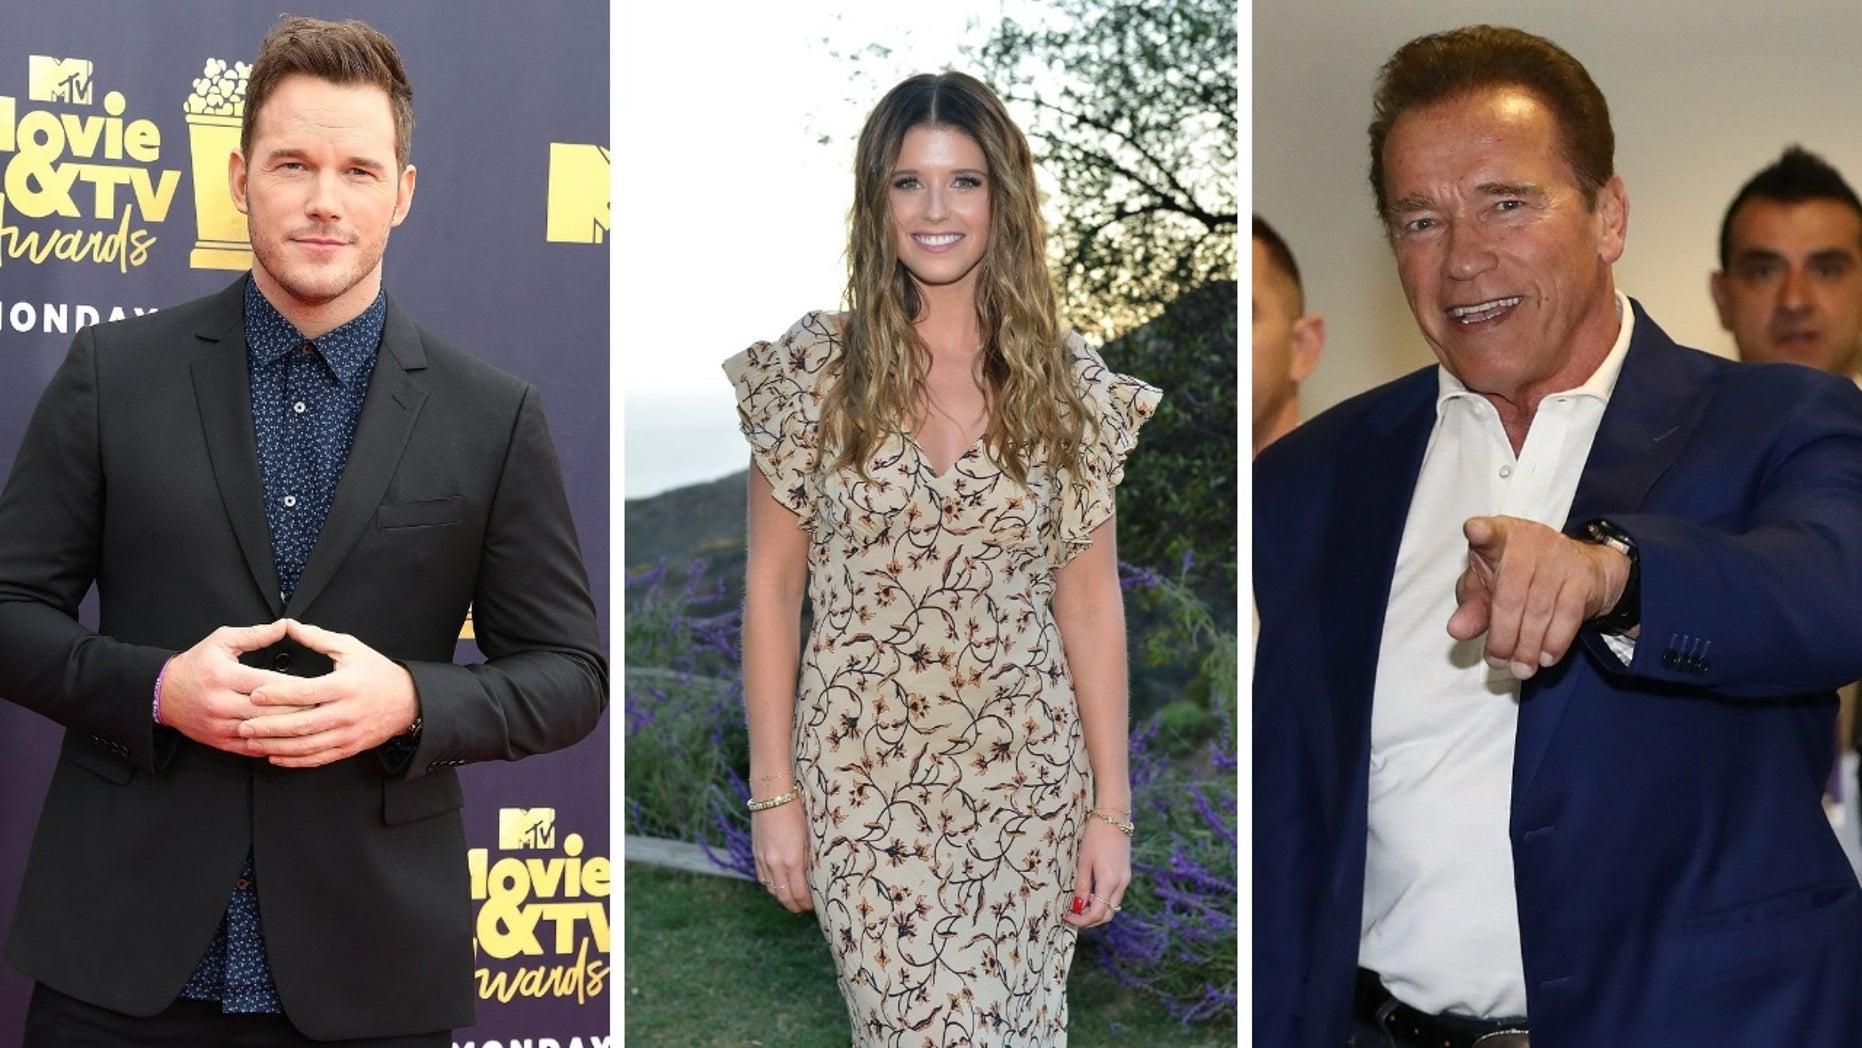 Chris Pratt and his girlfriend Katherine Schwarzenegger were spotted getting breakfast with her dad Arnold Schwarzenegger on Sunday, Nov. 11, 2018.